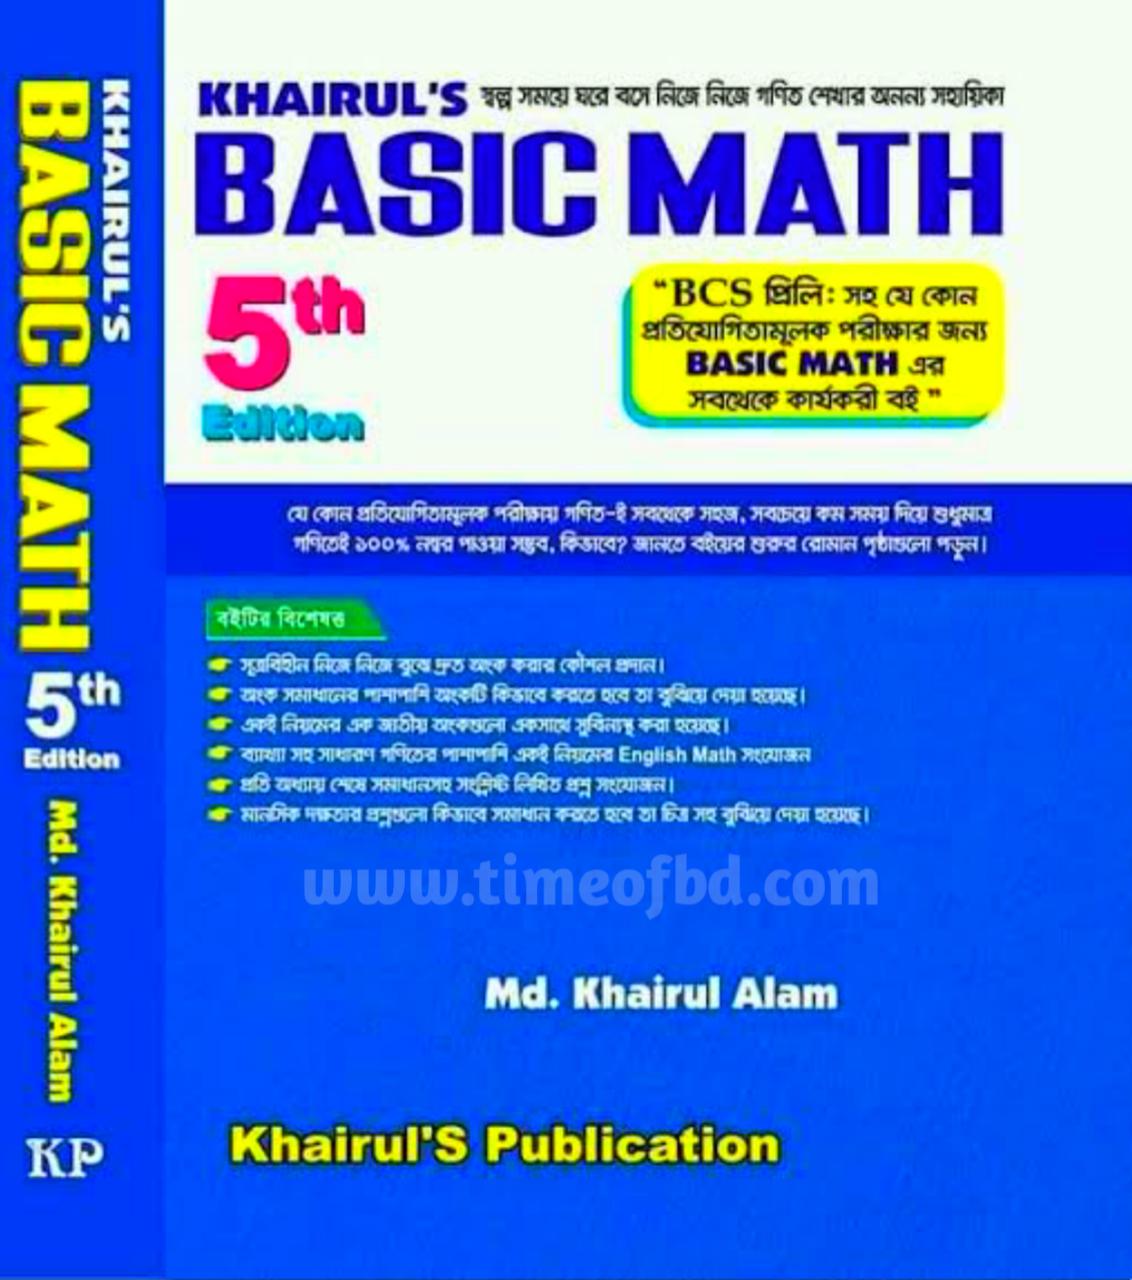 khairul basic math pdf, khairul basic math, khairuls basic math pdf, khairul basic math 5th edition pdf, khairul basic math pdf 2021